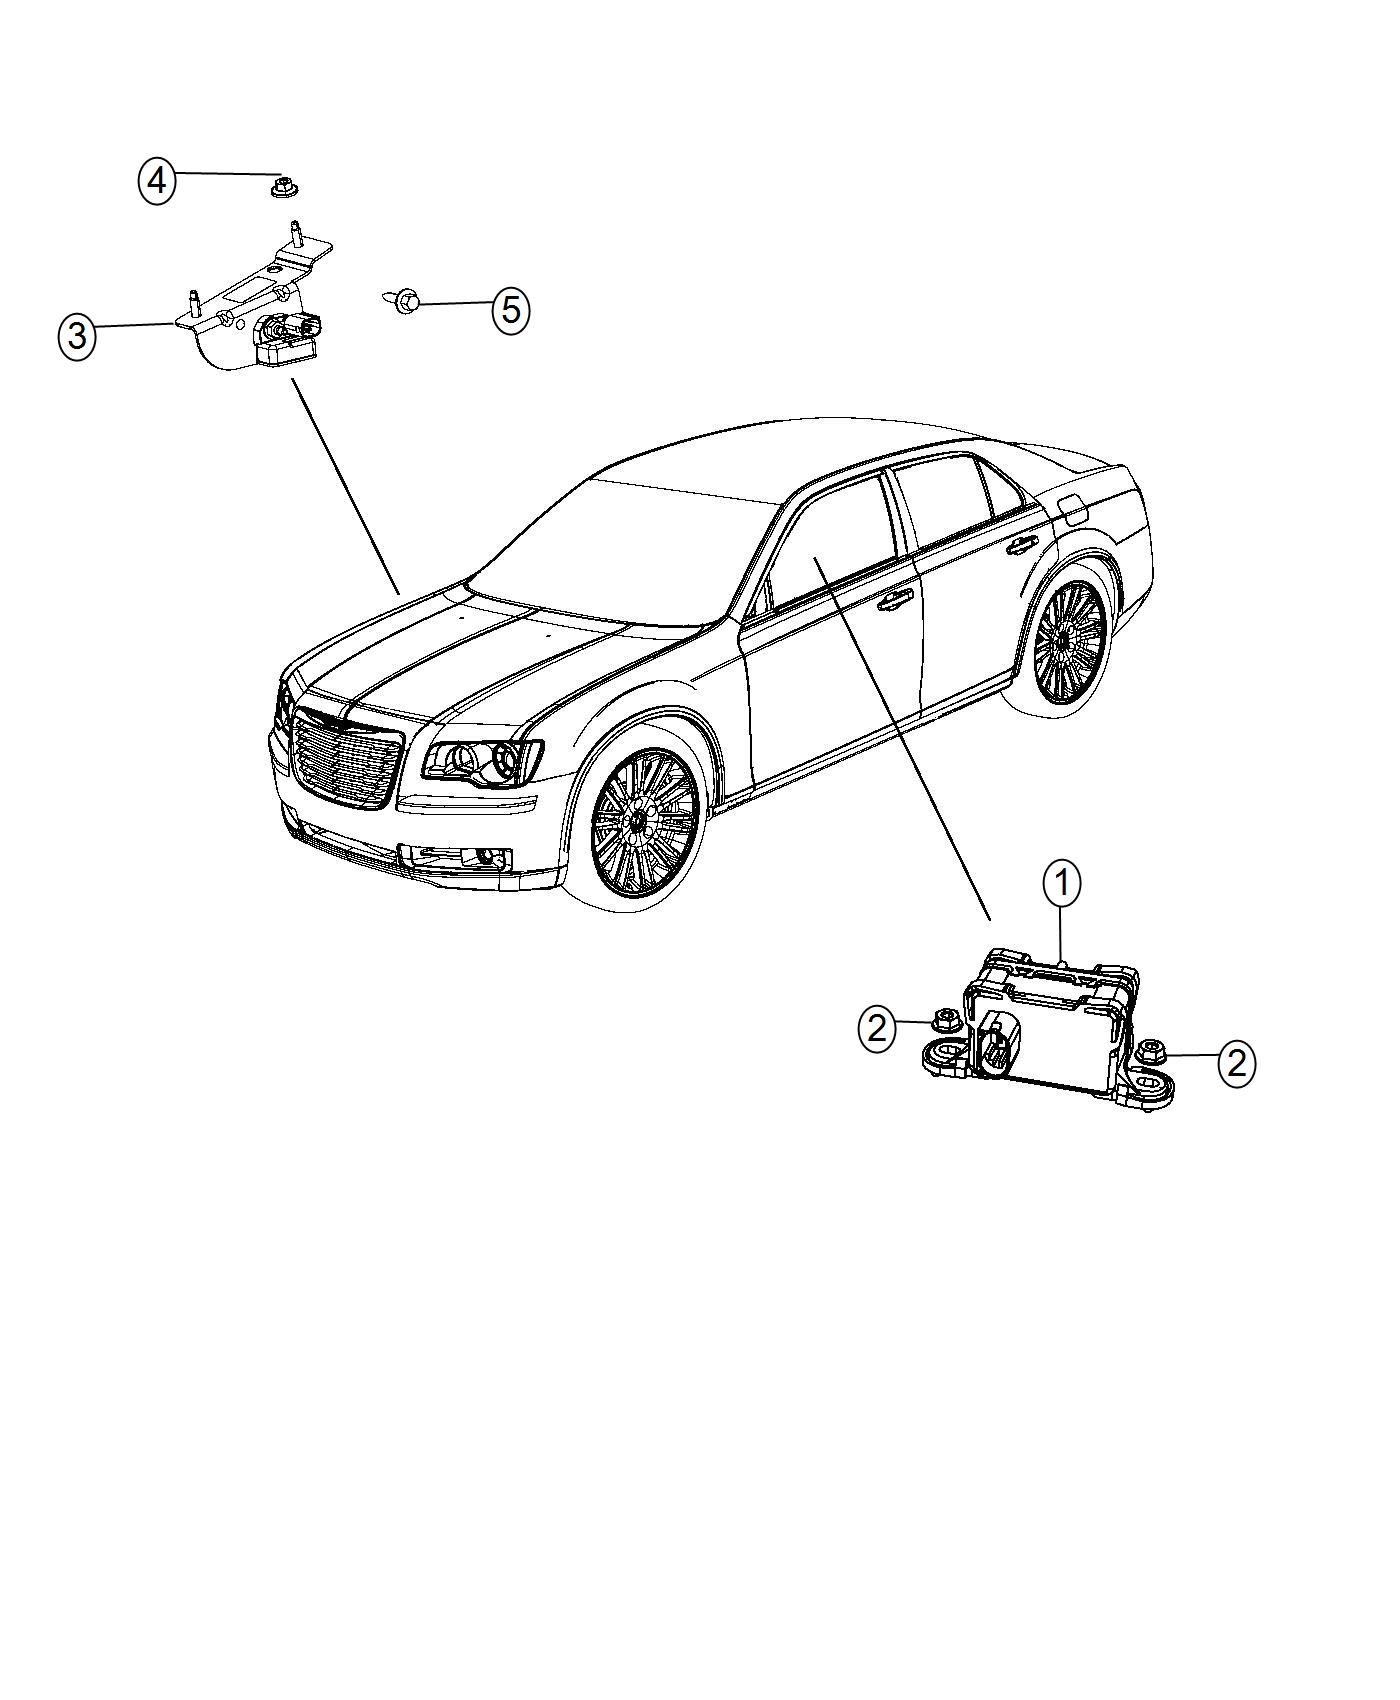 Chrysler 300 Sensor Active Damping